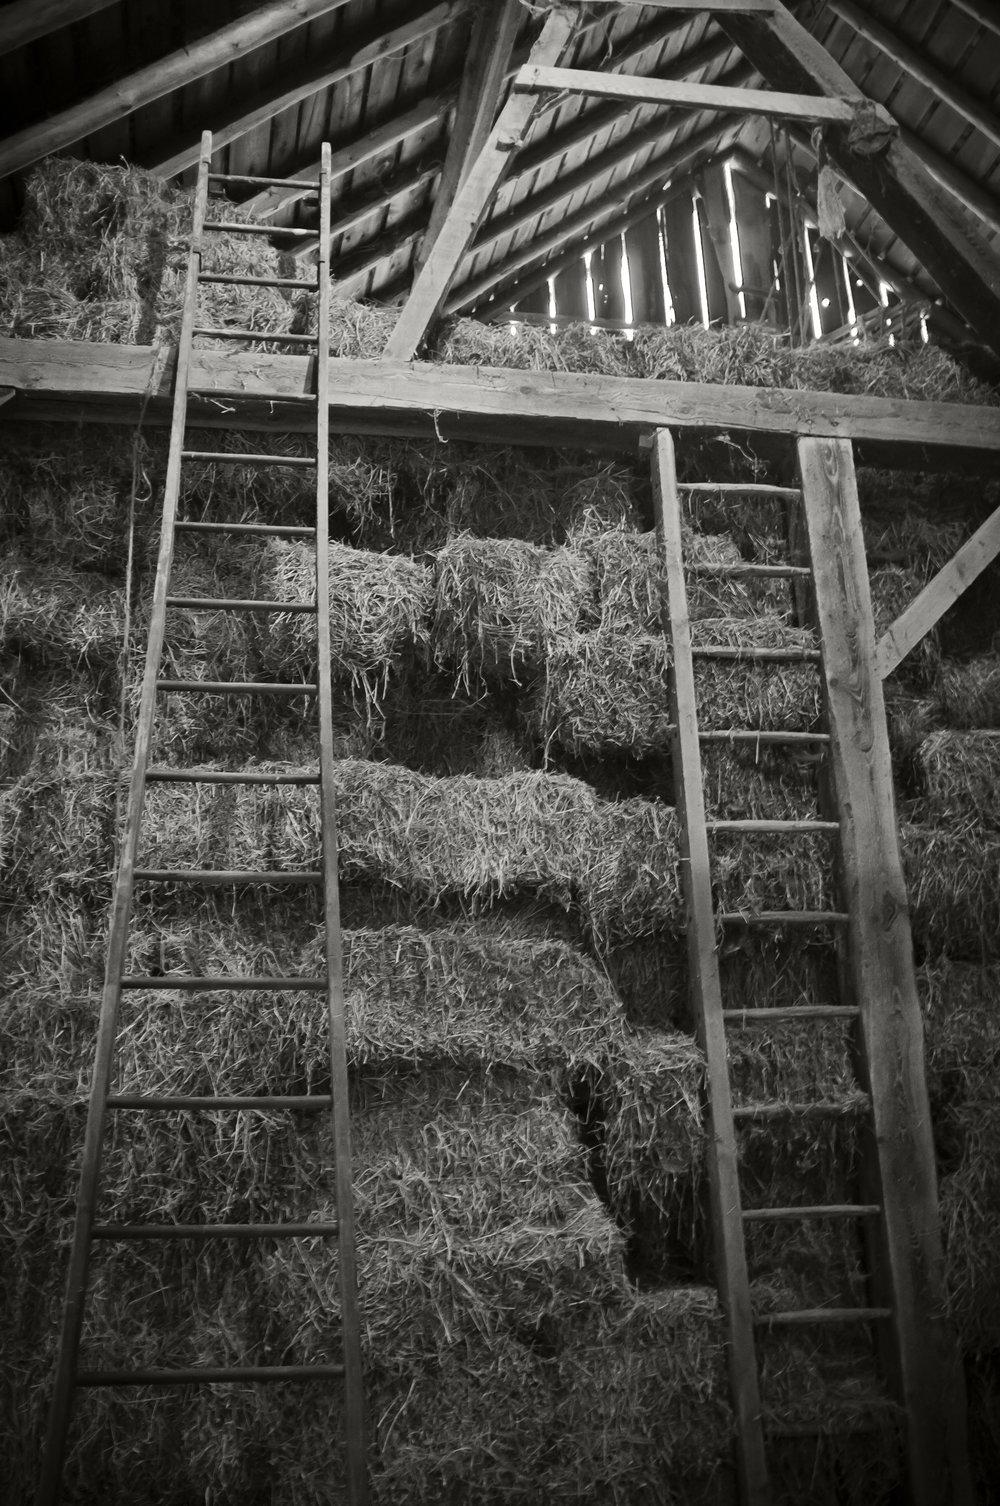 hayloft-ladders_8339296815_o.jpg